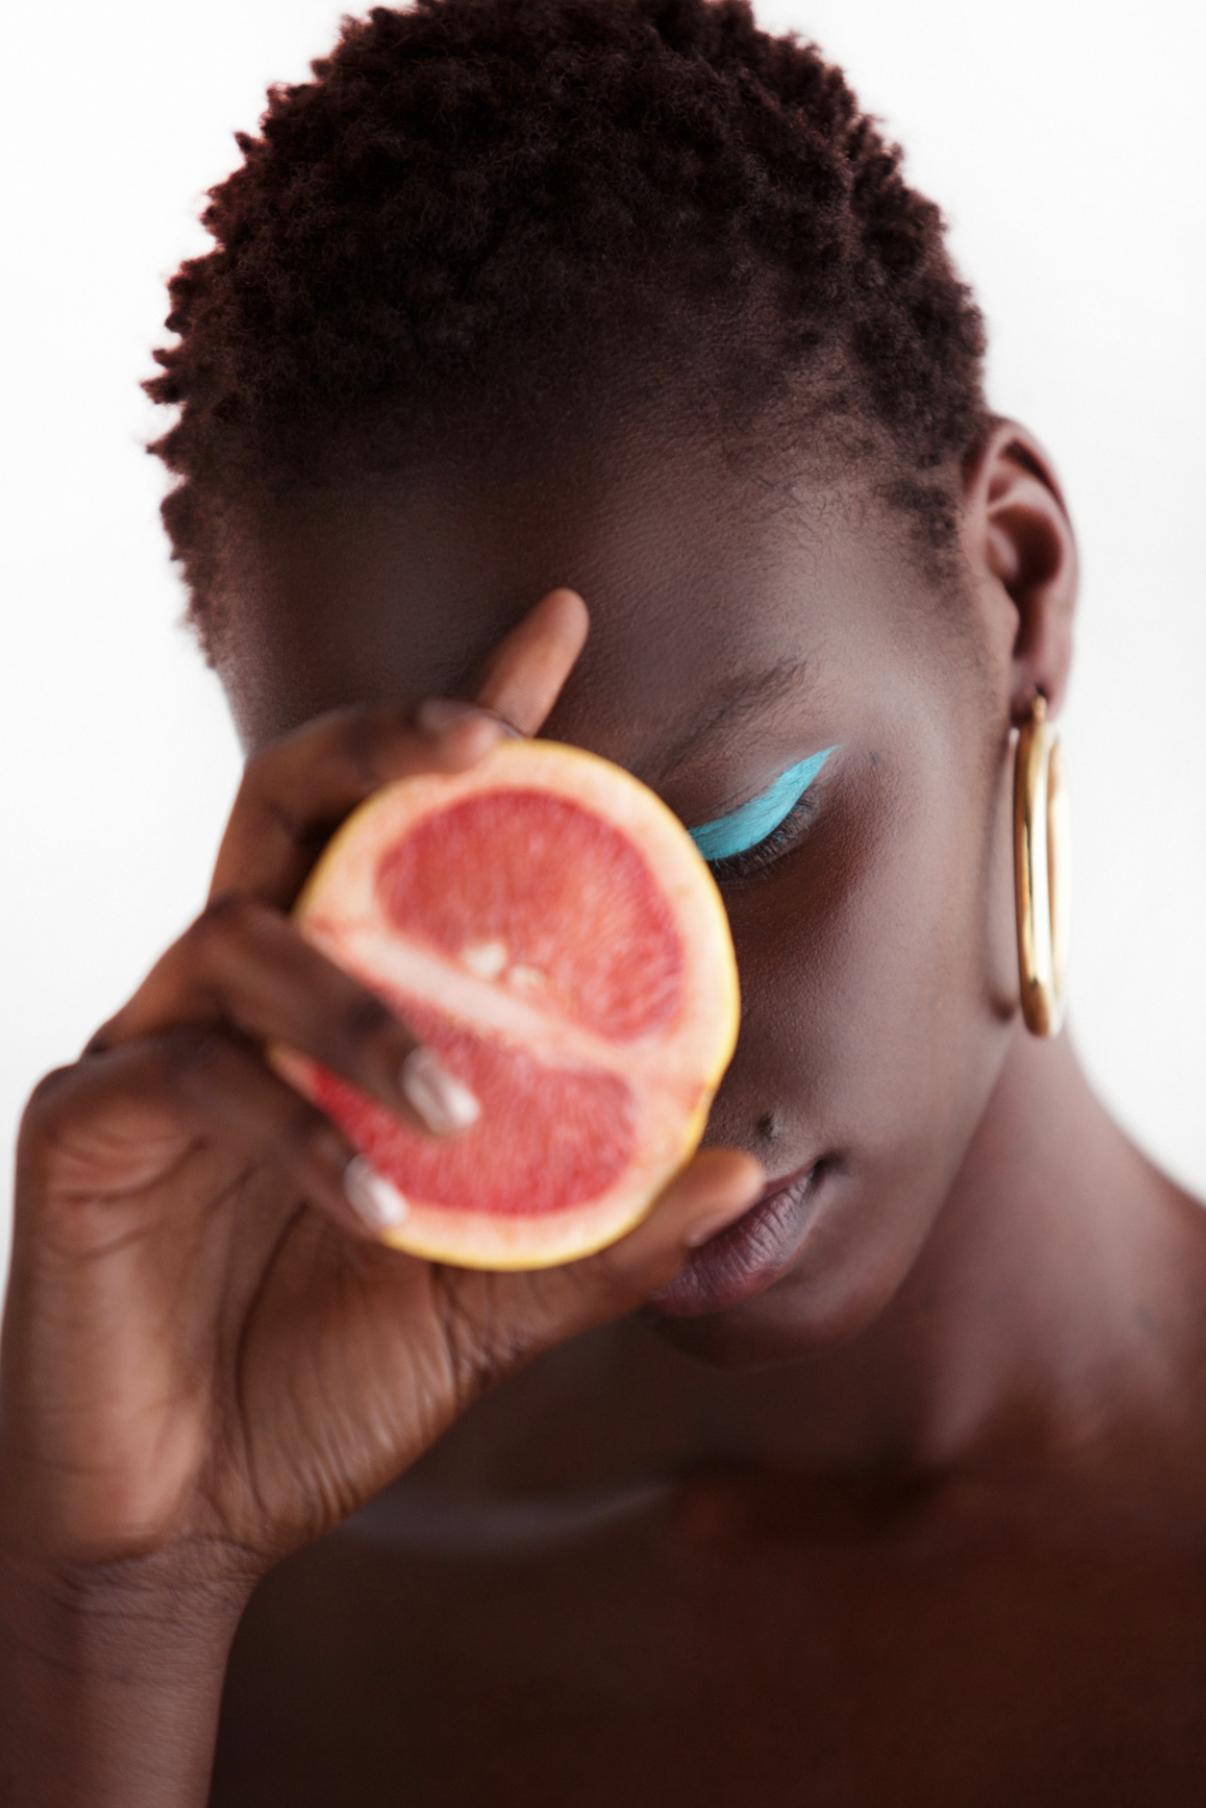 VICTORIA - PHOTOGRAPHER NATASHA KILLEEN@ahsatankilleenMODEL VICTORIA @jadaahvictoria @debutmanagementHMUA VANESSA COLLINS @vanessacollinsSTYLING PAIGE MARY GRACE @paigemarygrace